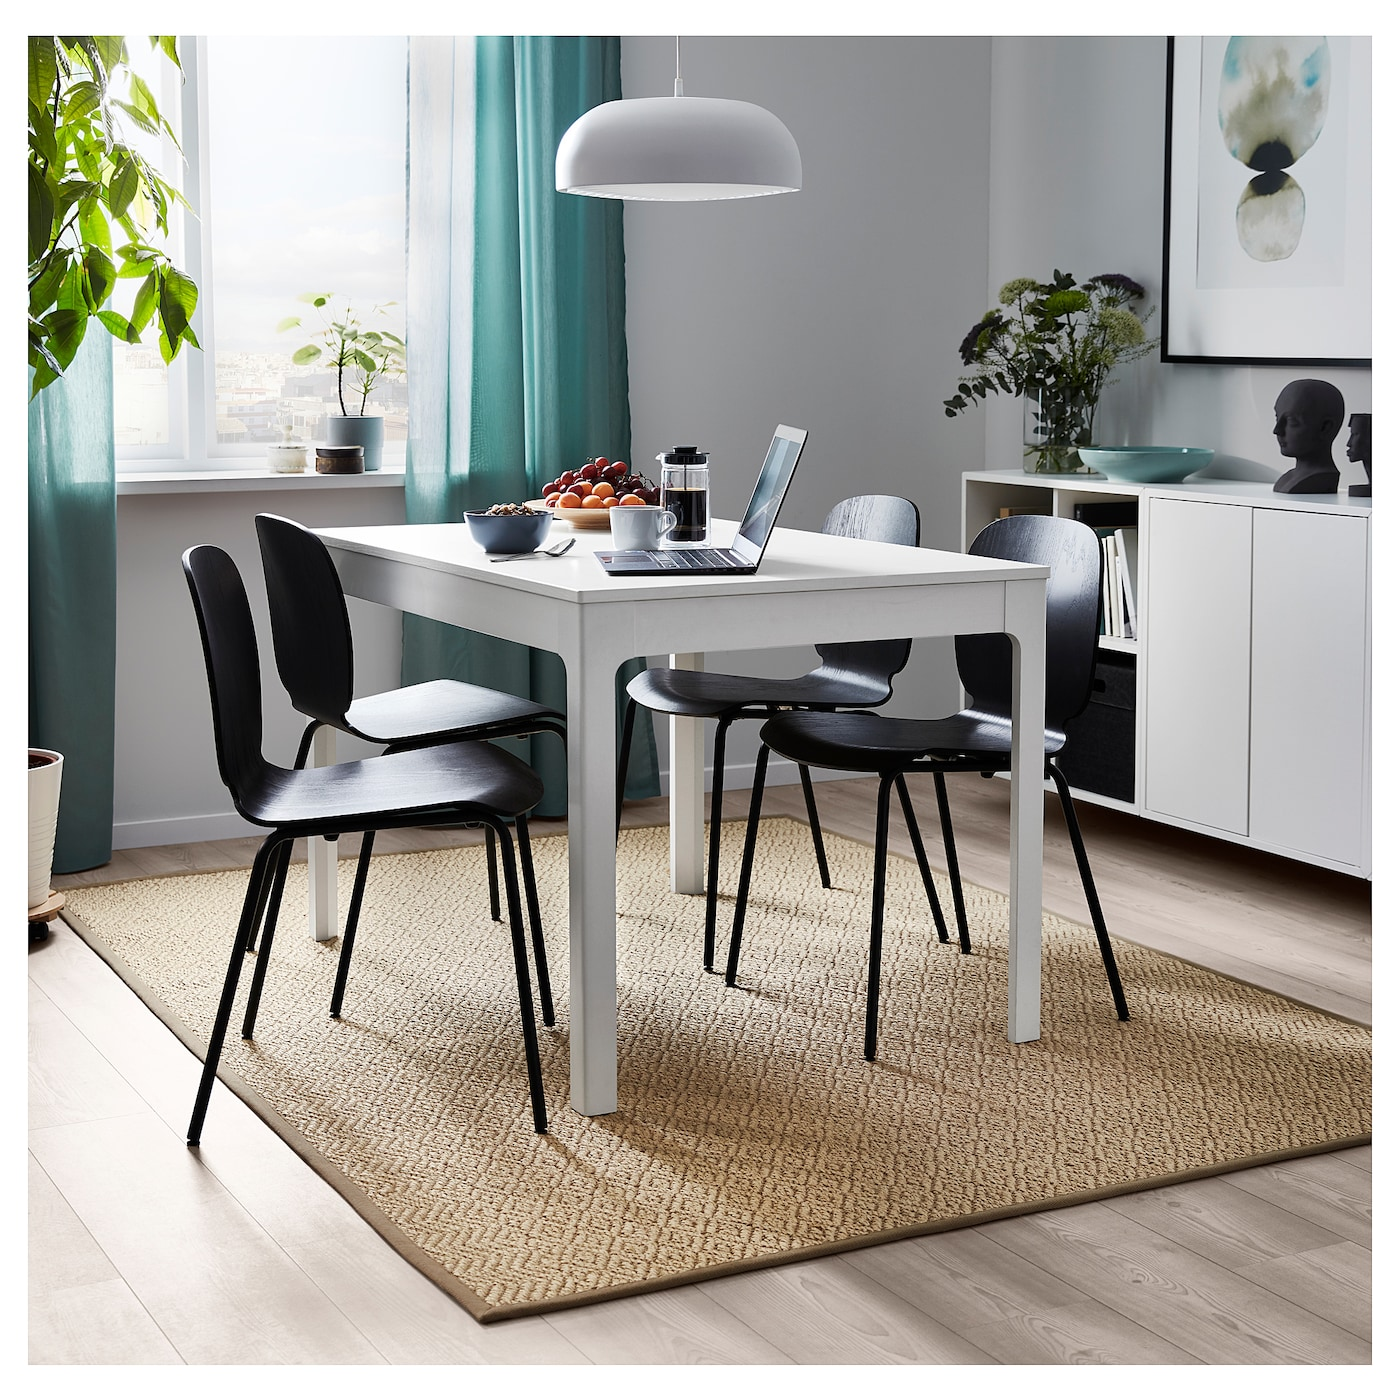 Vistoft Tapis Tisse A Plat Naturel 170 X 240 Cm Ikea